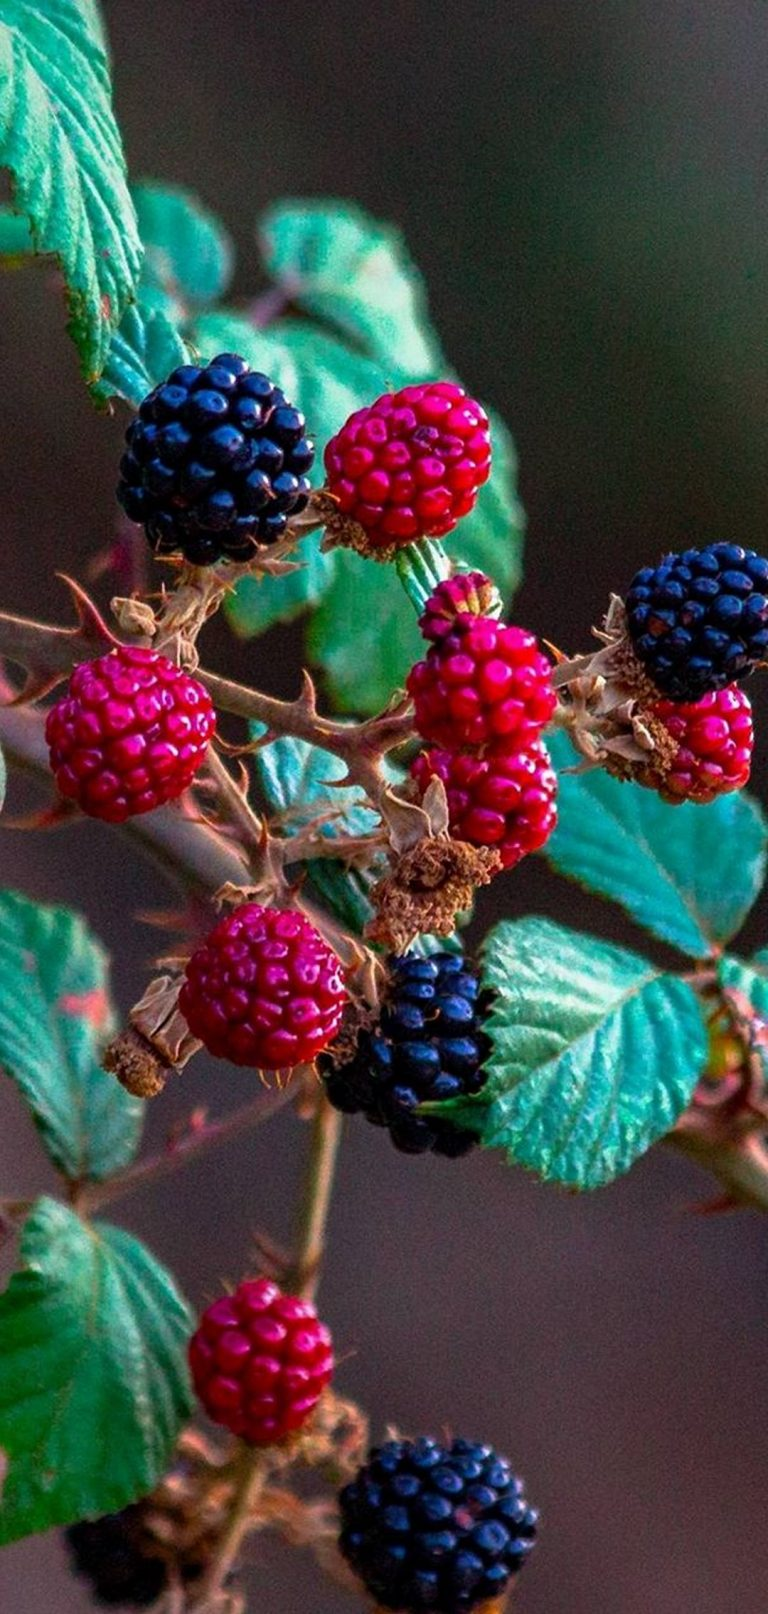 Fruits Raspberry Blackberry 1080x2270 768x1614